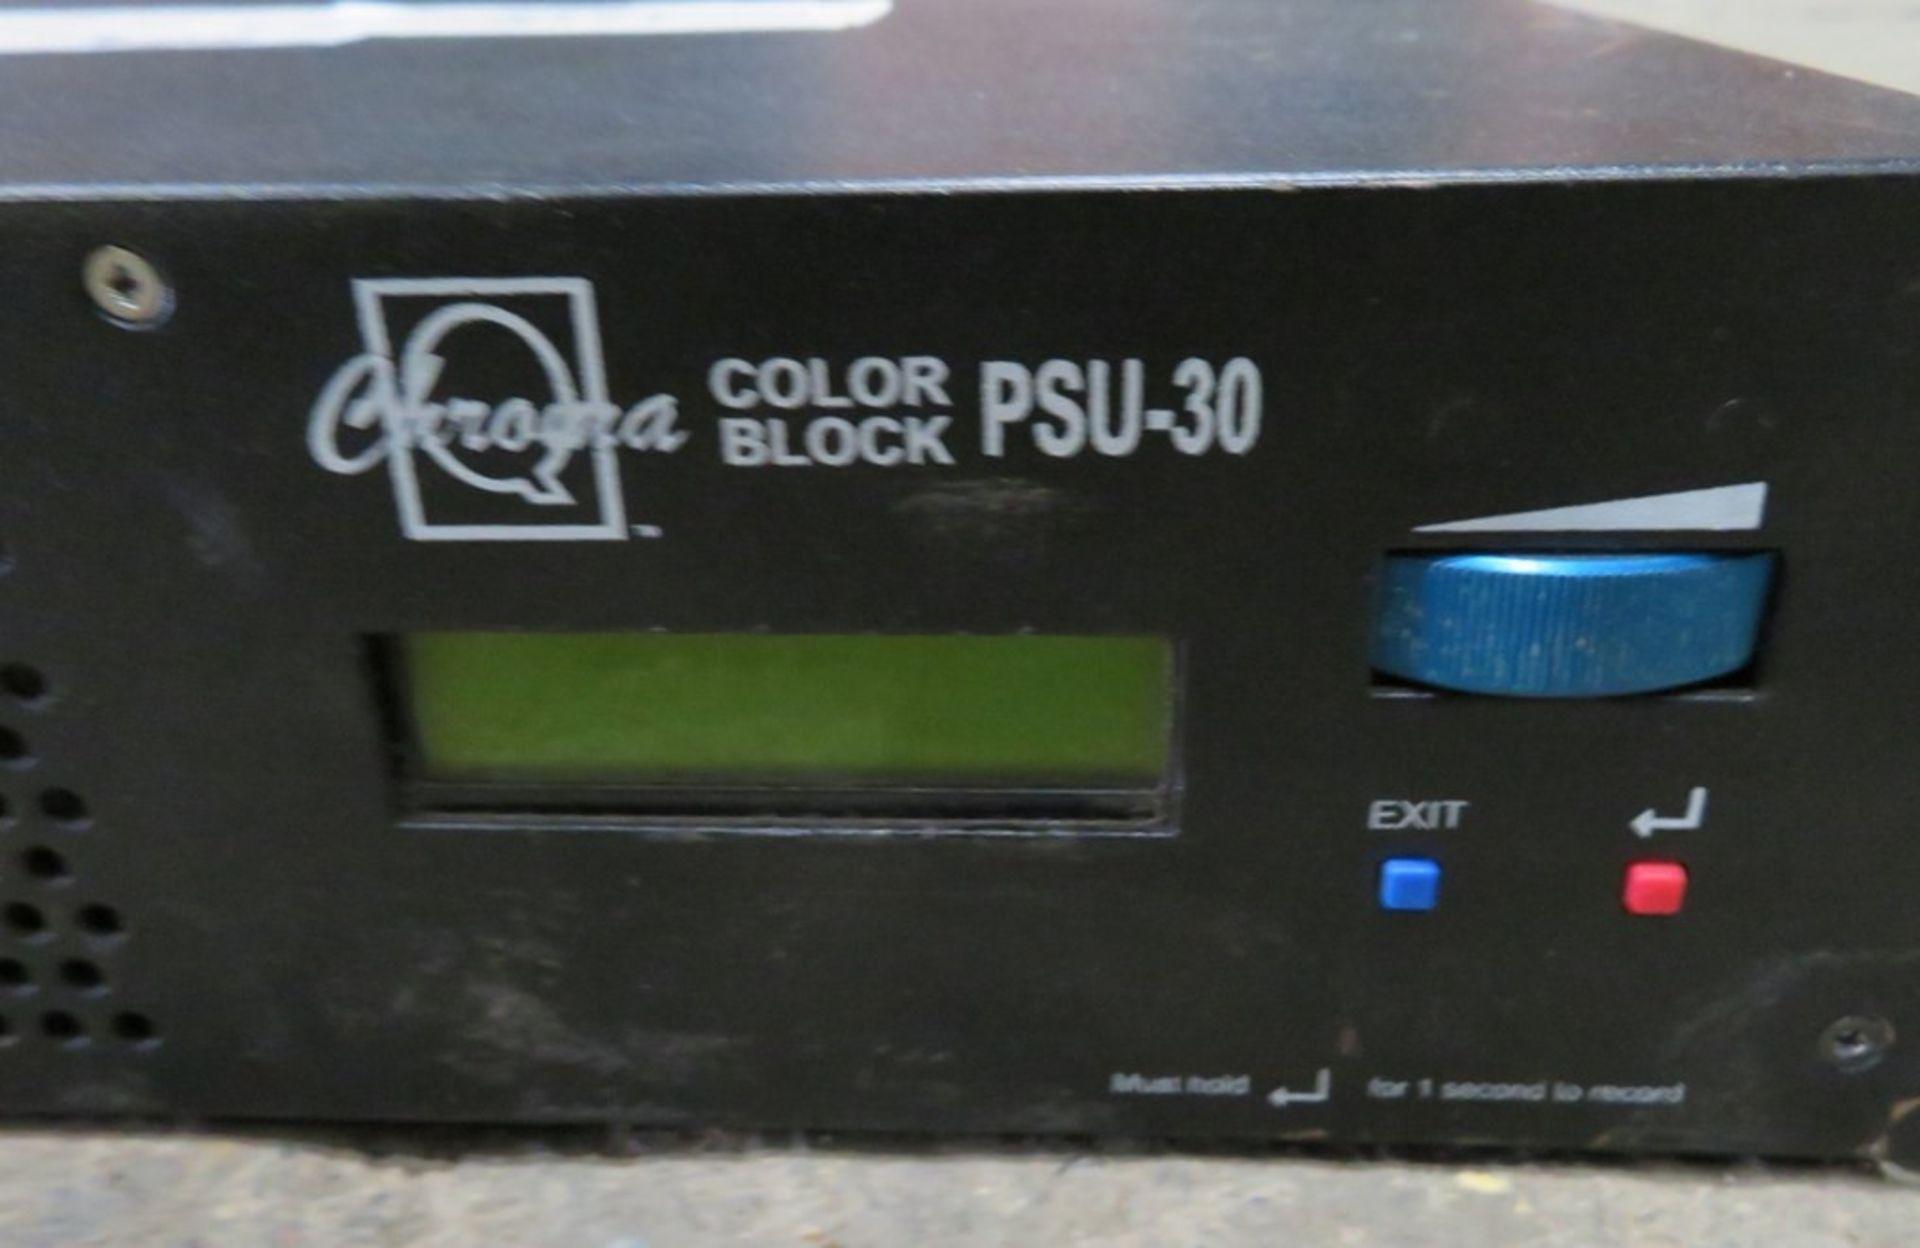 A ChromaQ Colorblock PSU-30 DB4 30 way Power Supply Unit-located at GLS Lighting, The Alpha